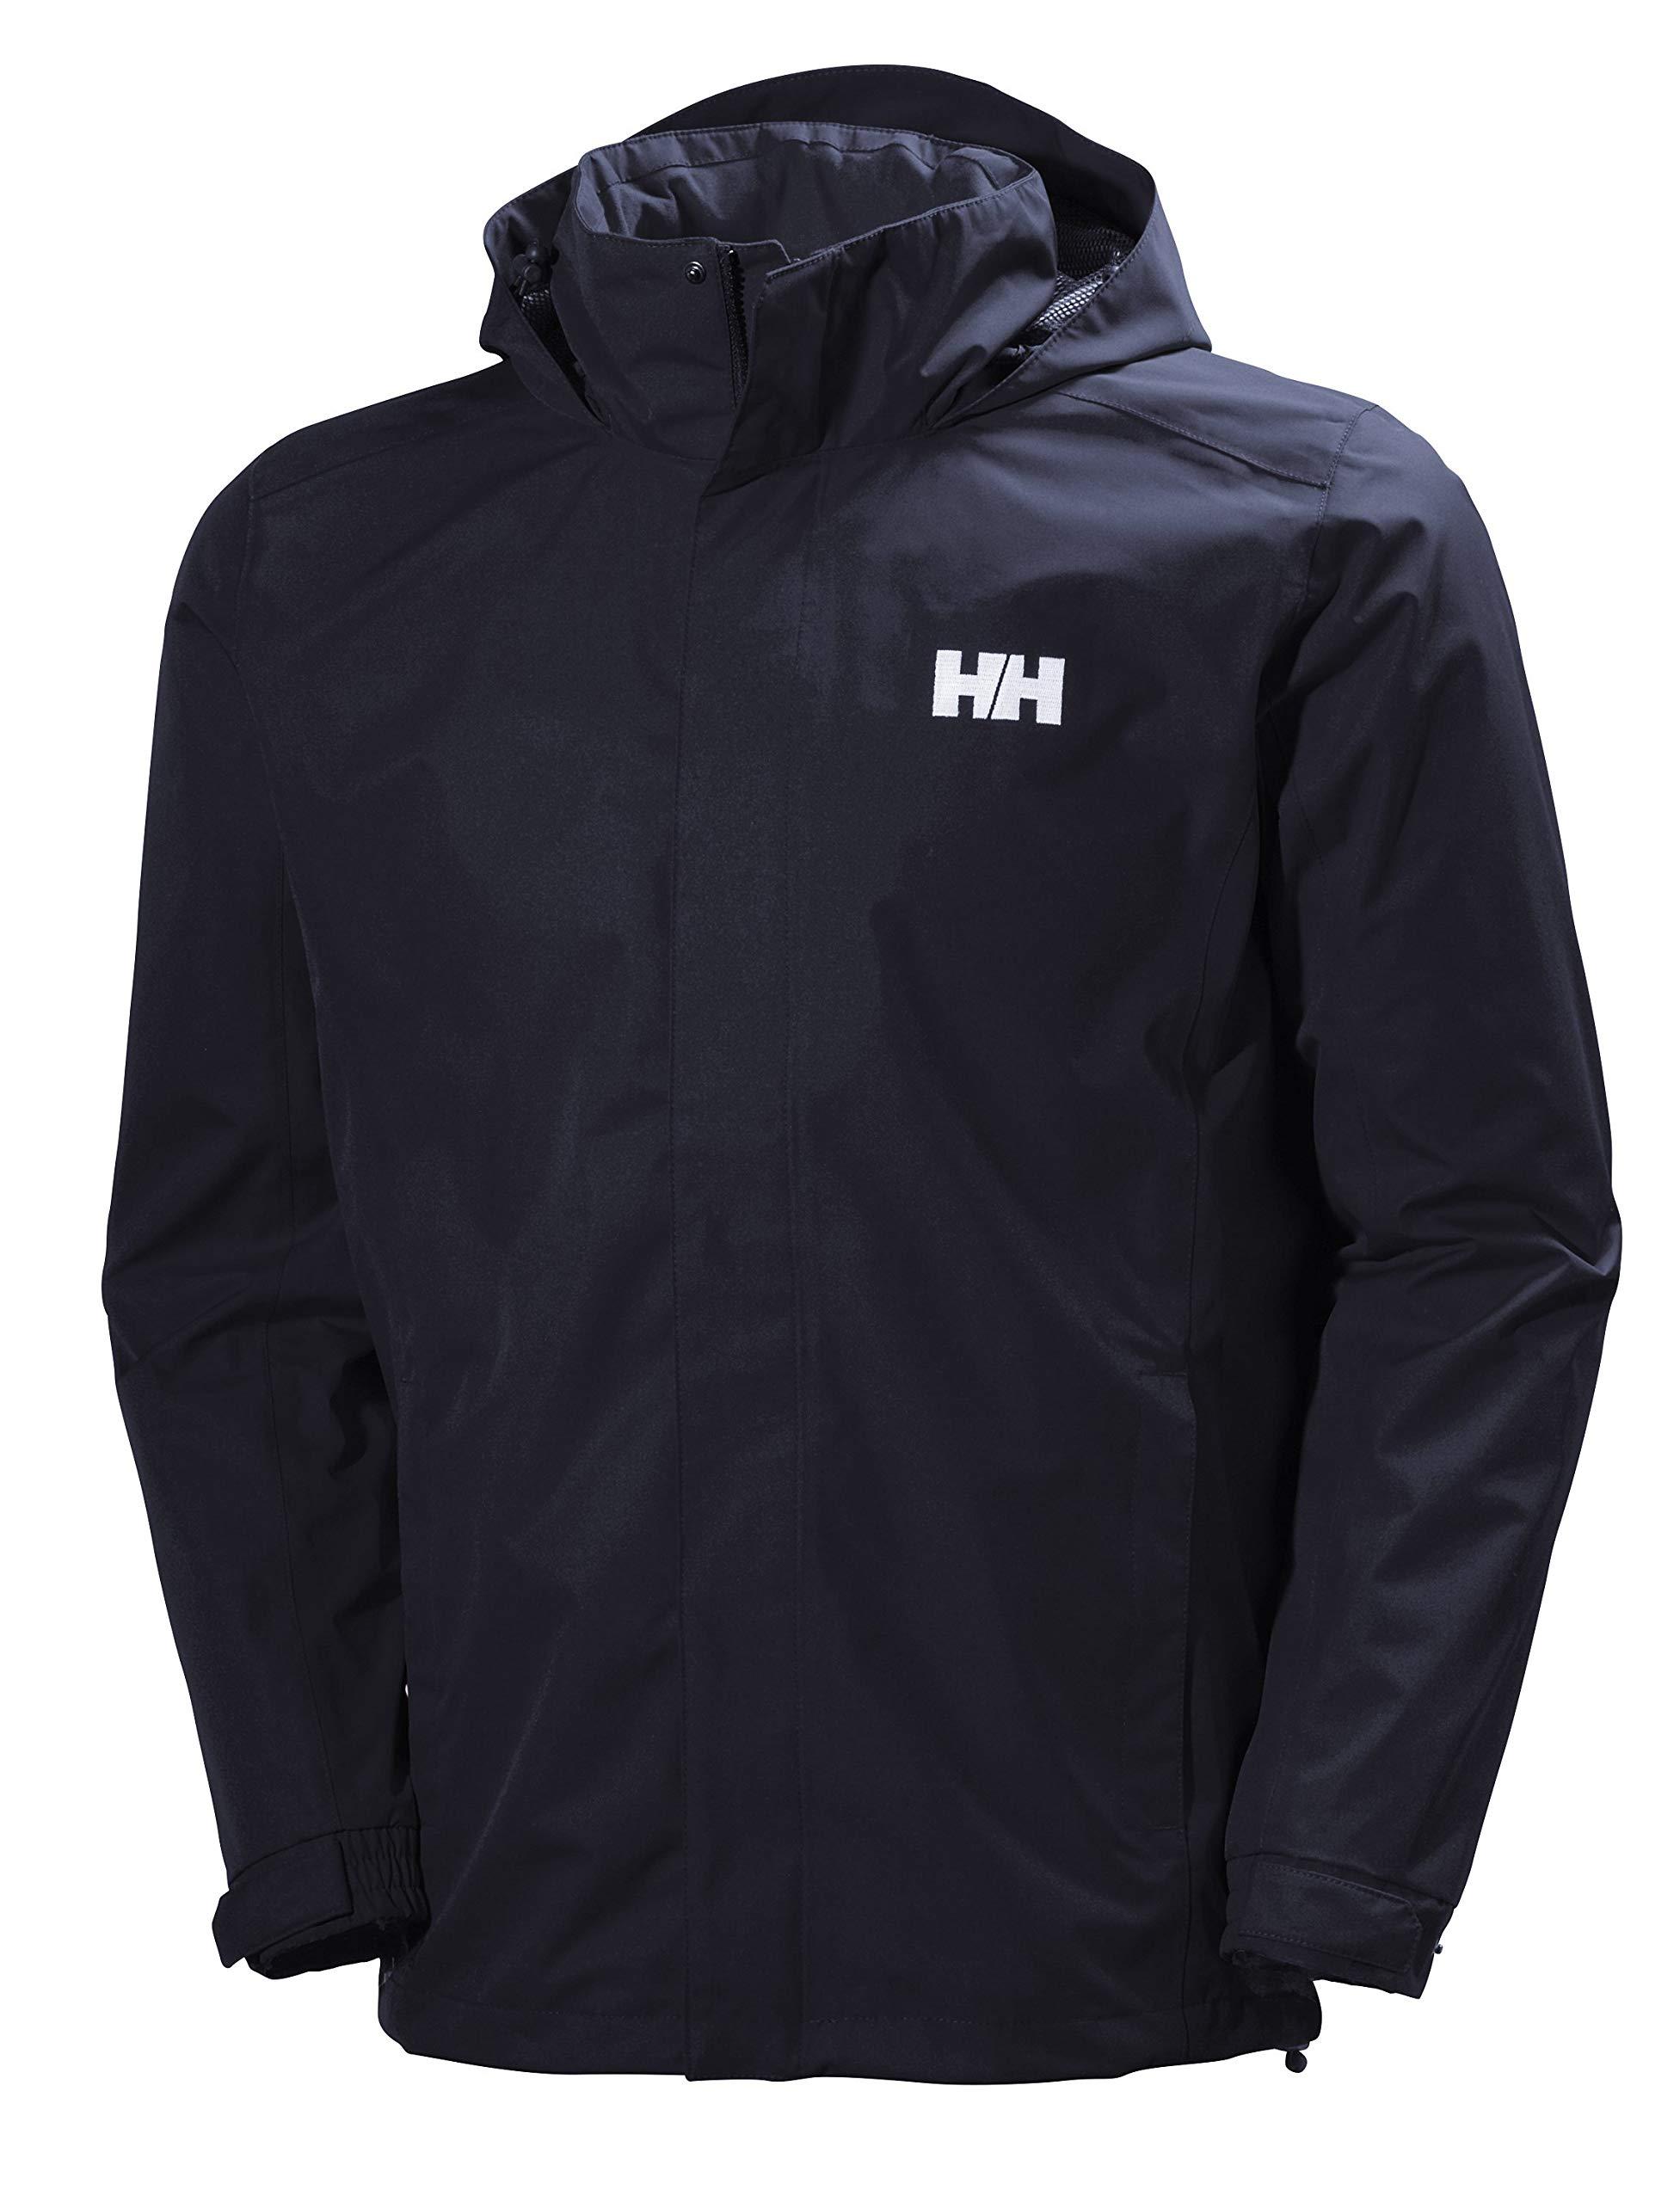 Helly Hansen Men's Dubliner Waterproof Windproof Breathable Rain Coat Jacket, 597 Navy, Large by Helly Hansen